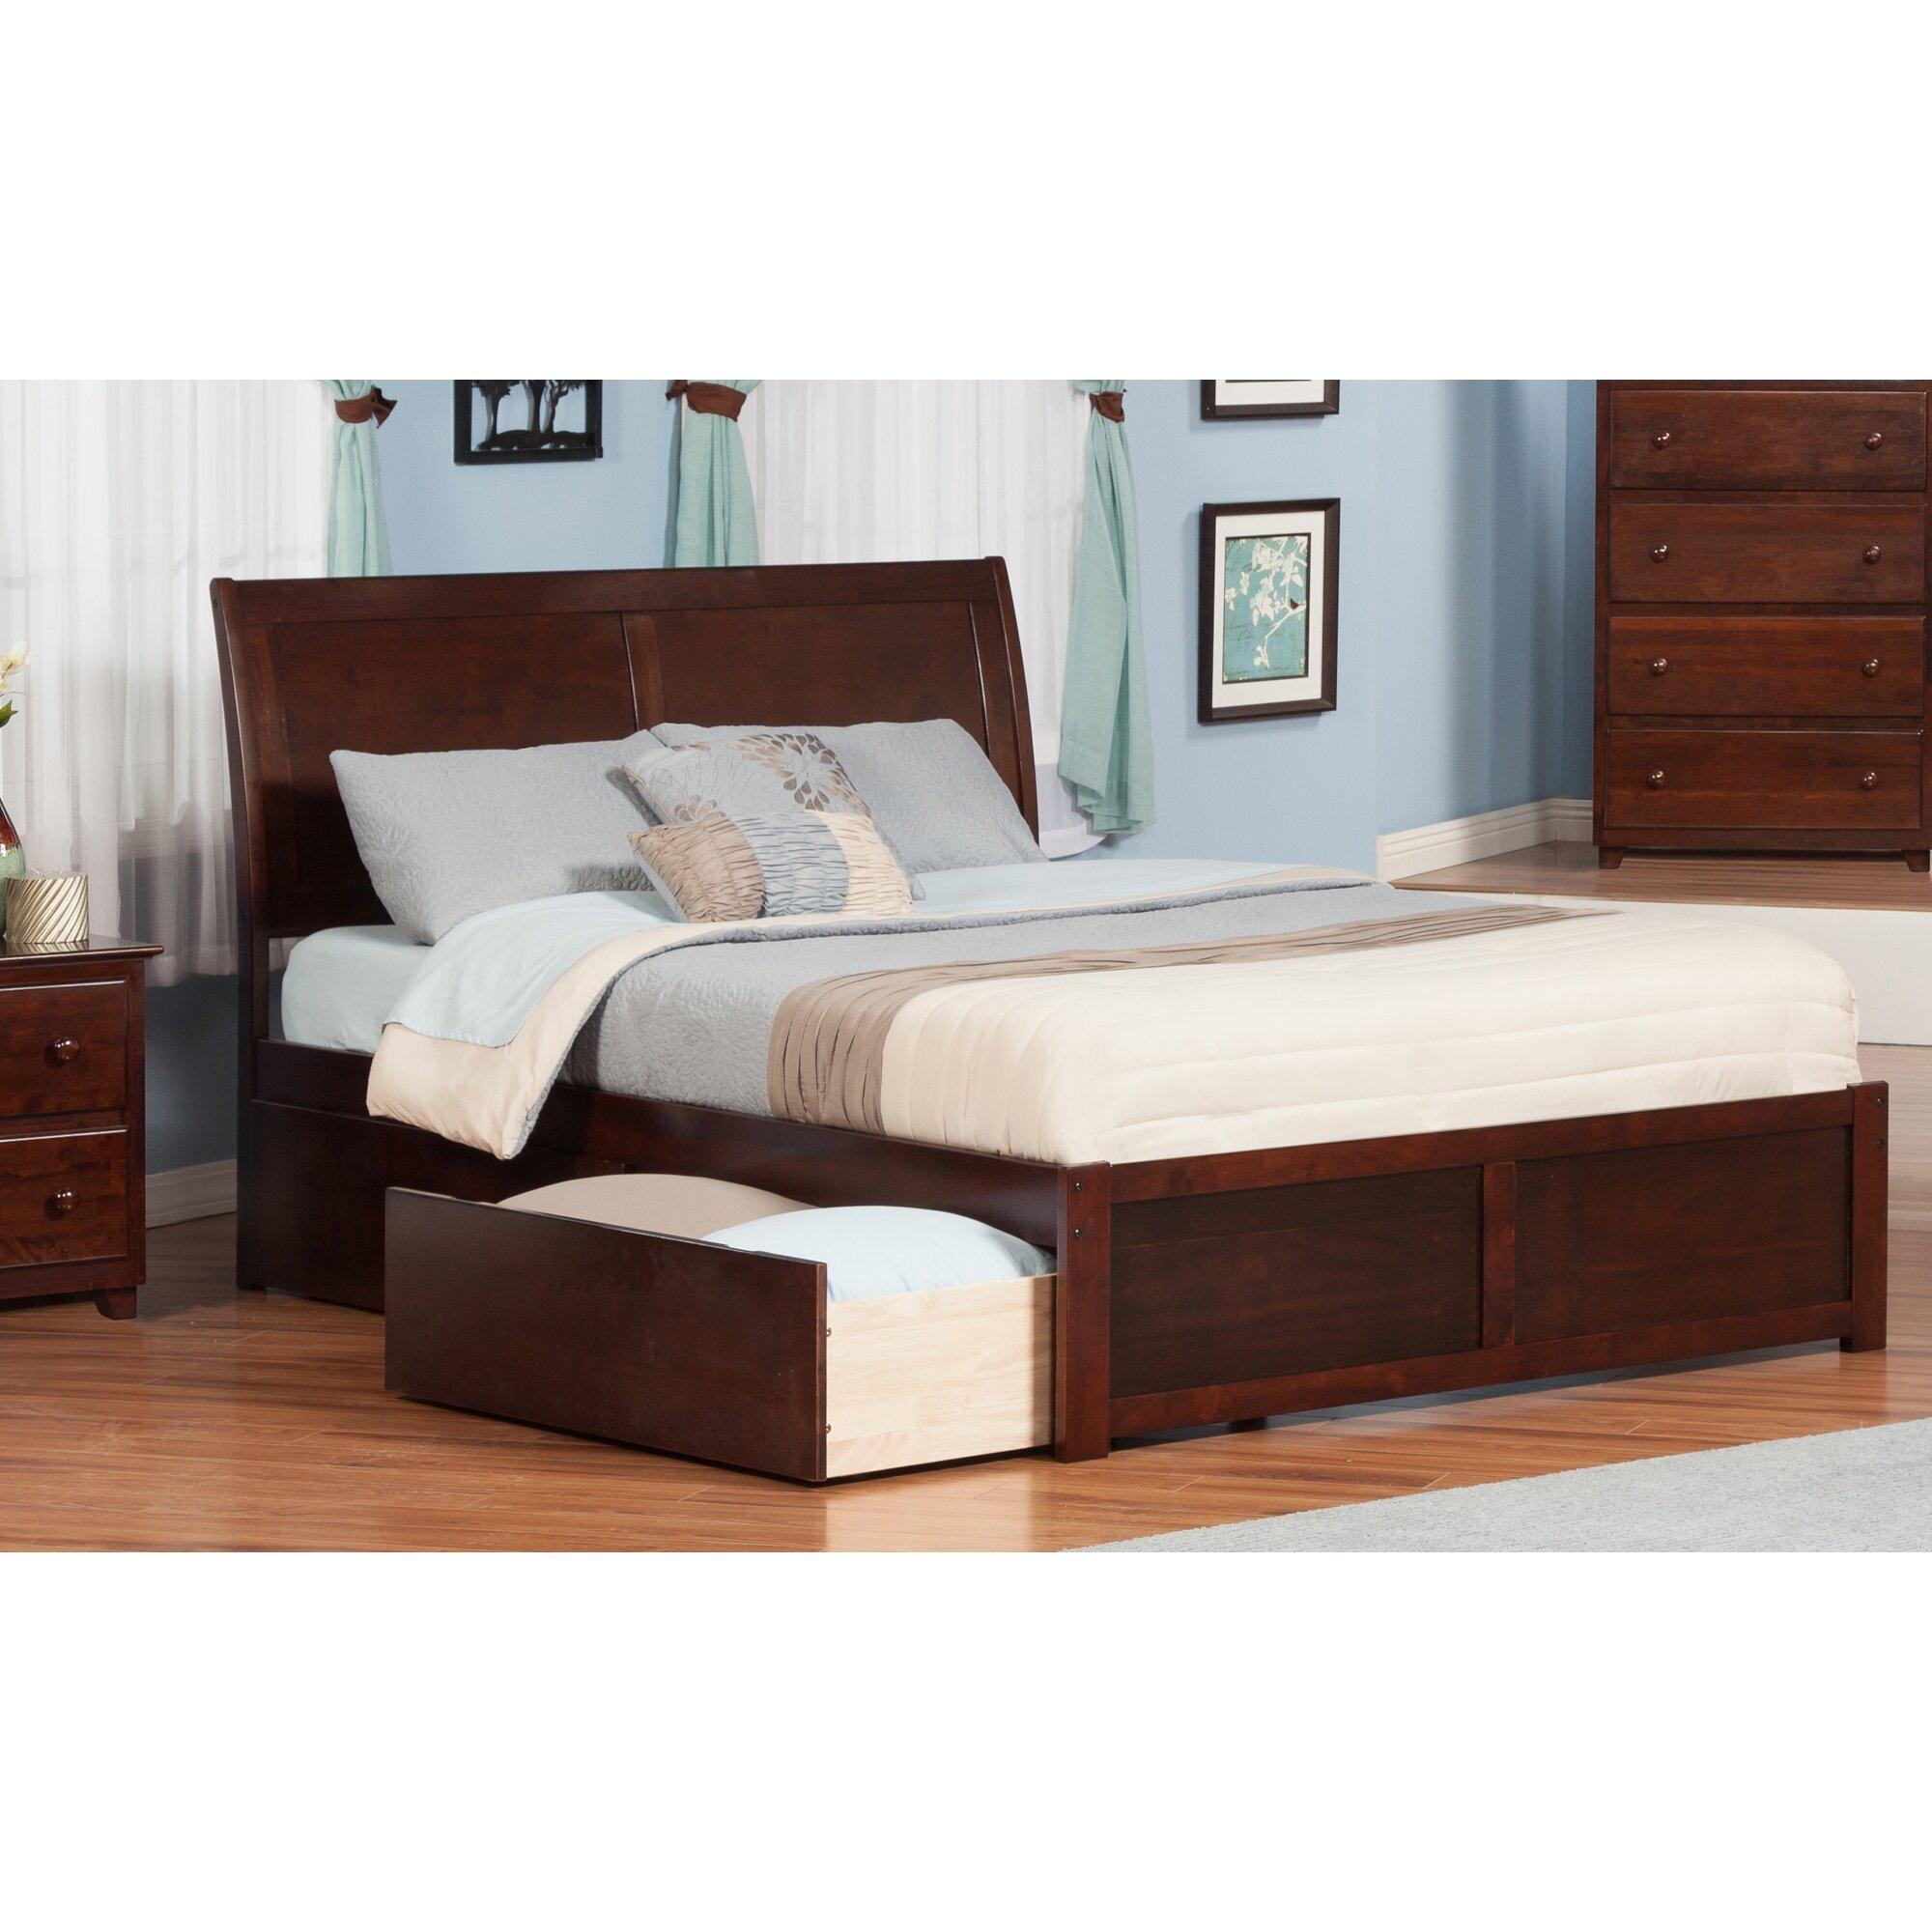 atlantic furniture portland storage sleigh bed reviews wayfair. Black Bedroom Furniture Sets. Home Design Ideas